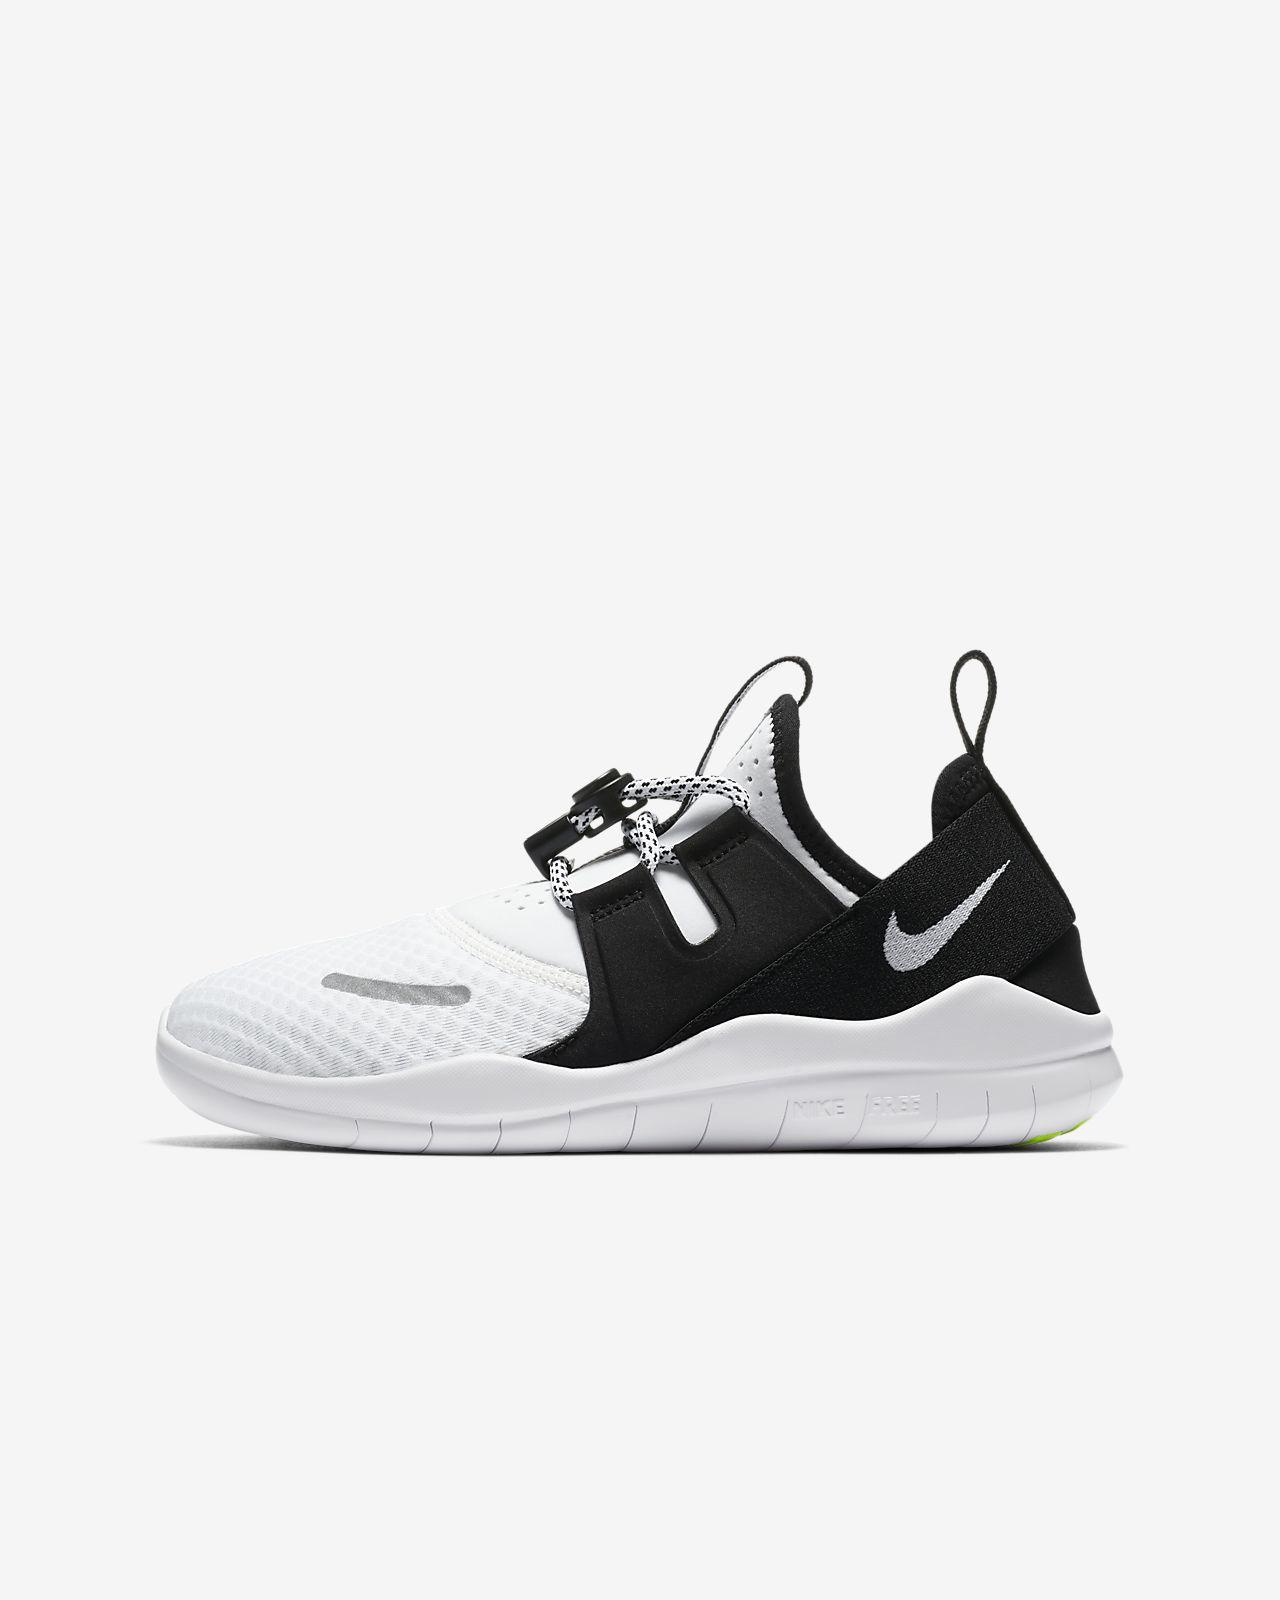 Nike Free RN Commuter 2018 Big Kids' Running Shoe